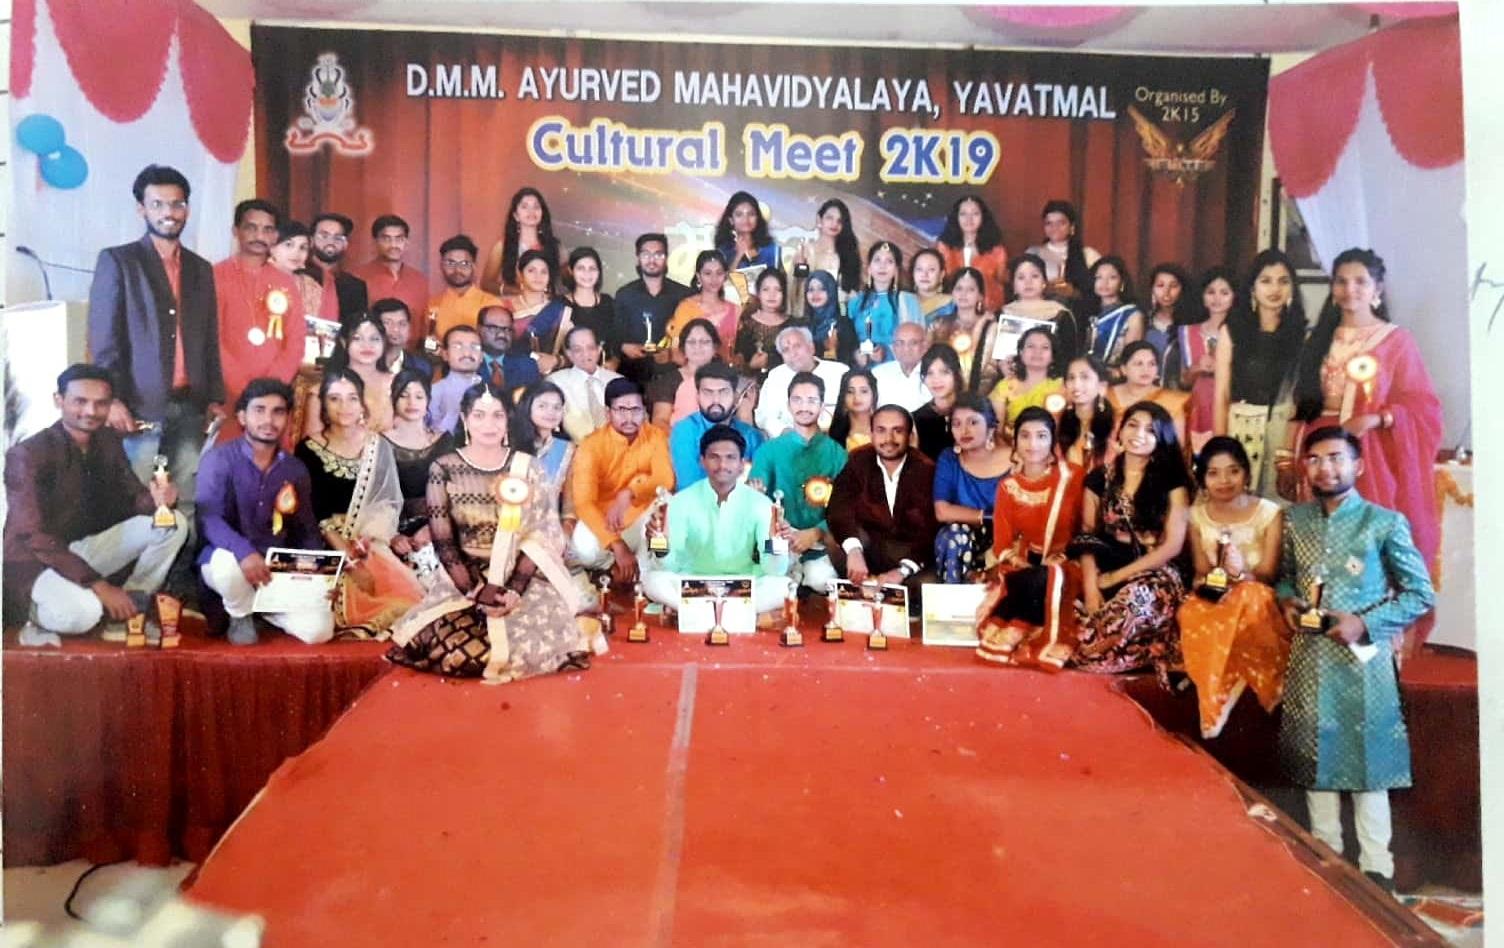 Dayabhai Maoji Majithiya Ayurved Mahavidyalaya, Yavatmal Image